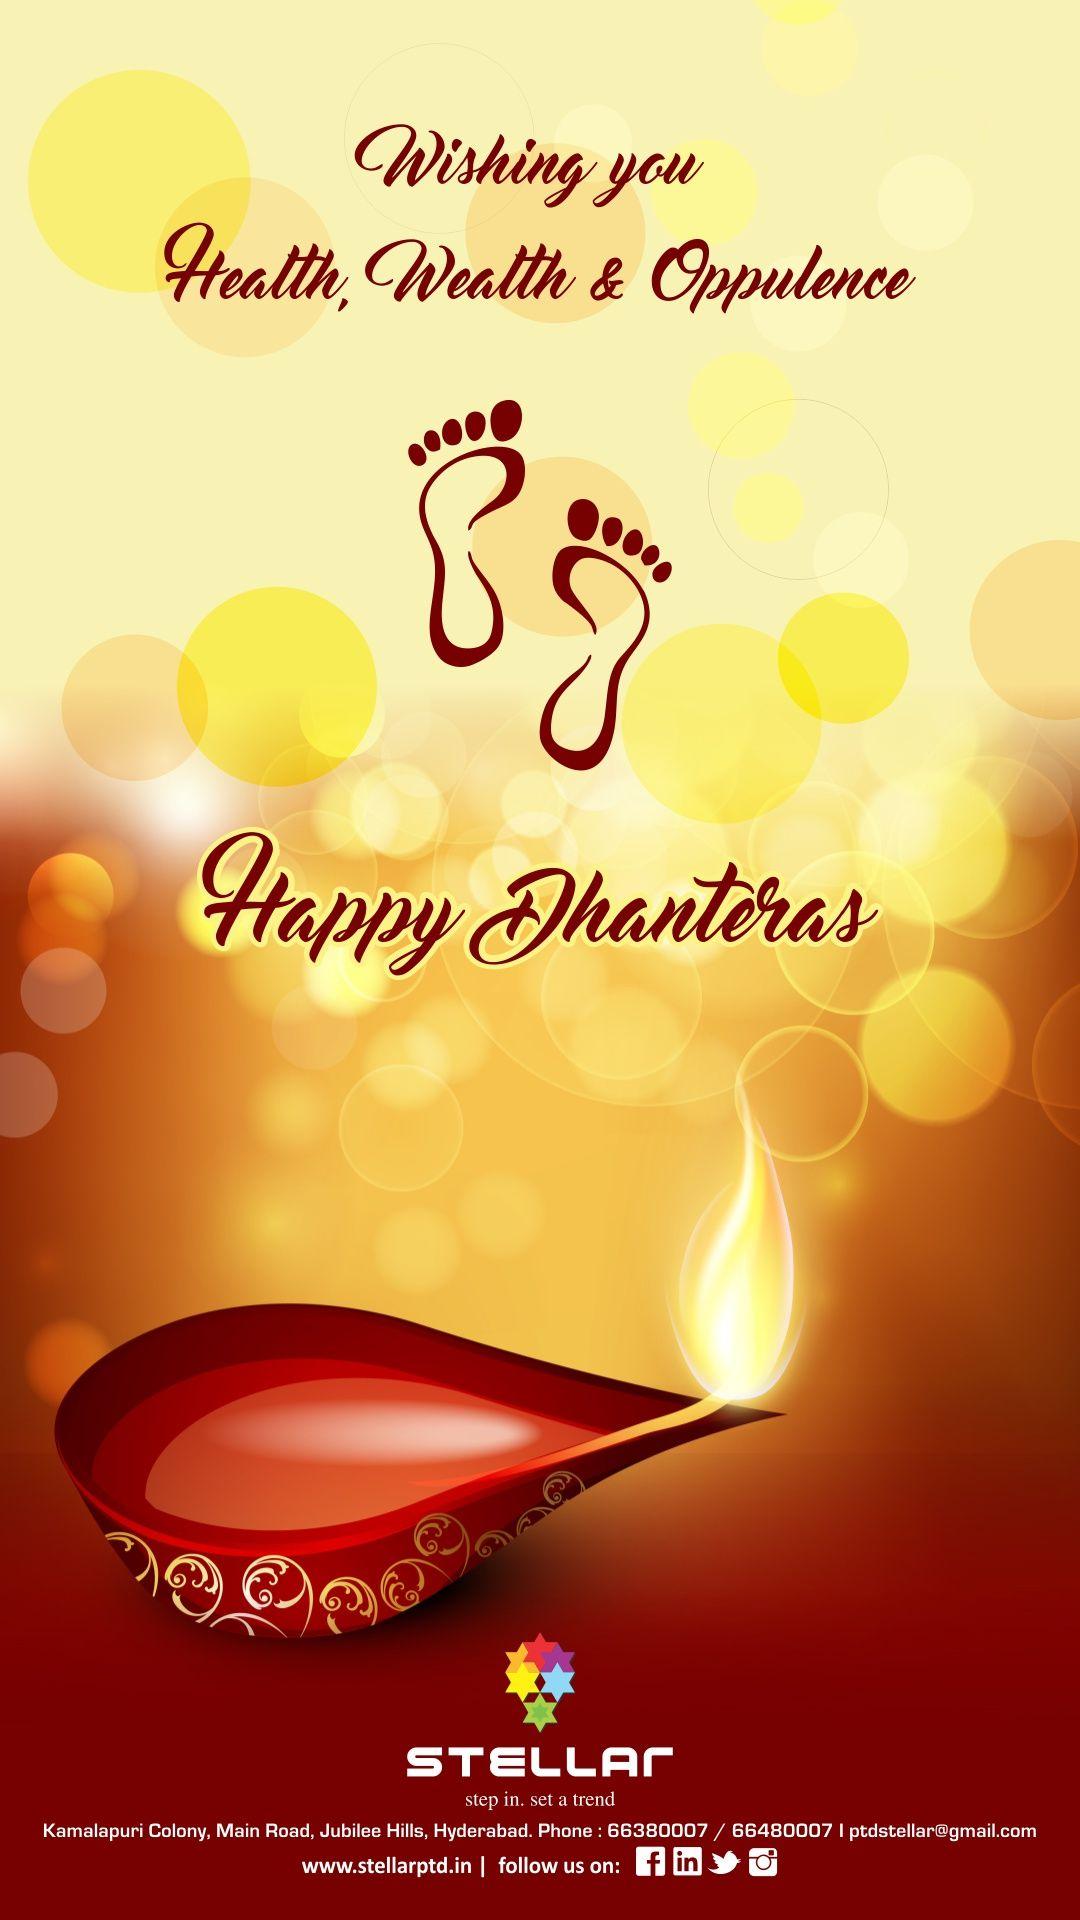 Wishes Everyone Happy Dhanteras Seasonal Greetings Pinterest